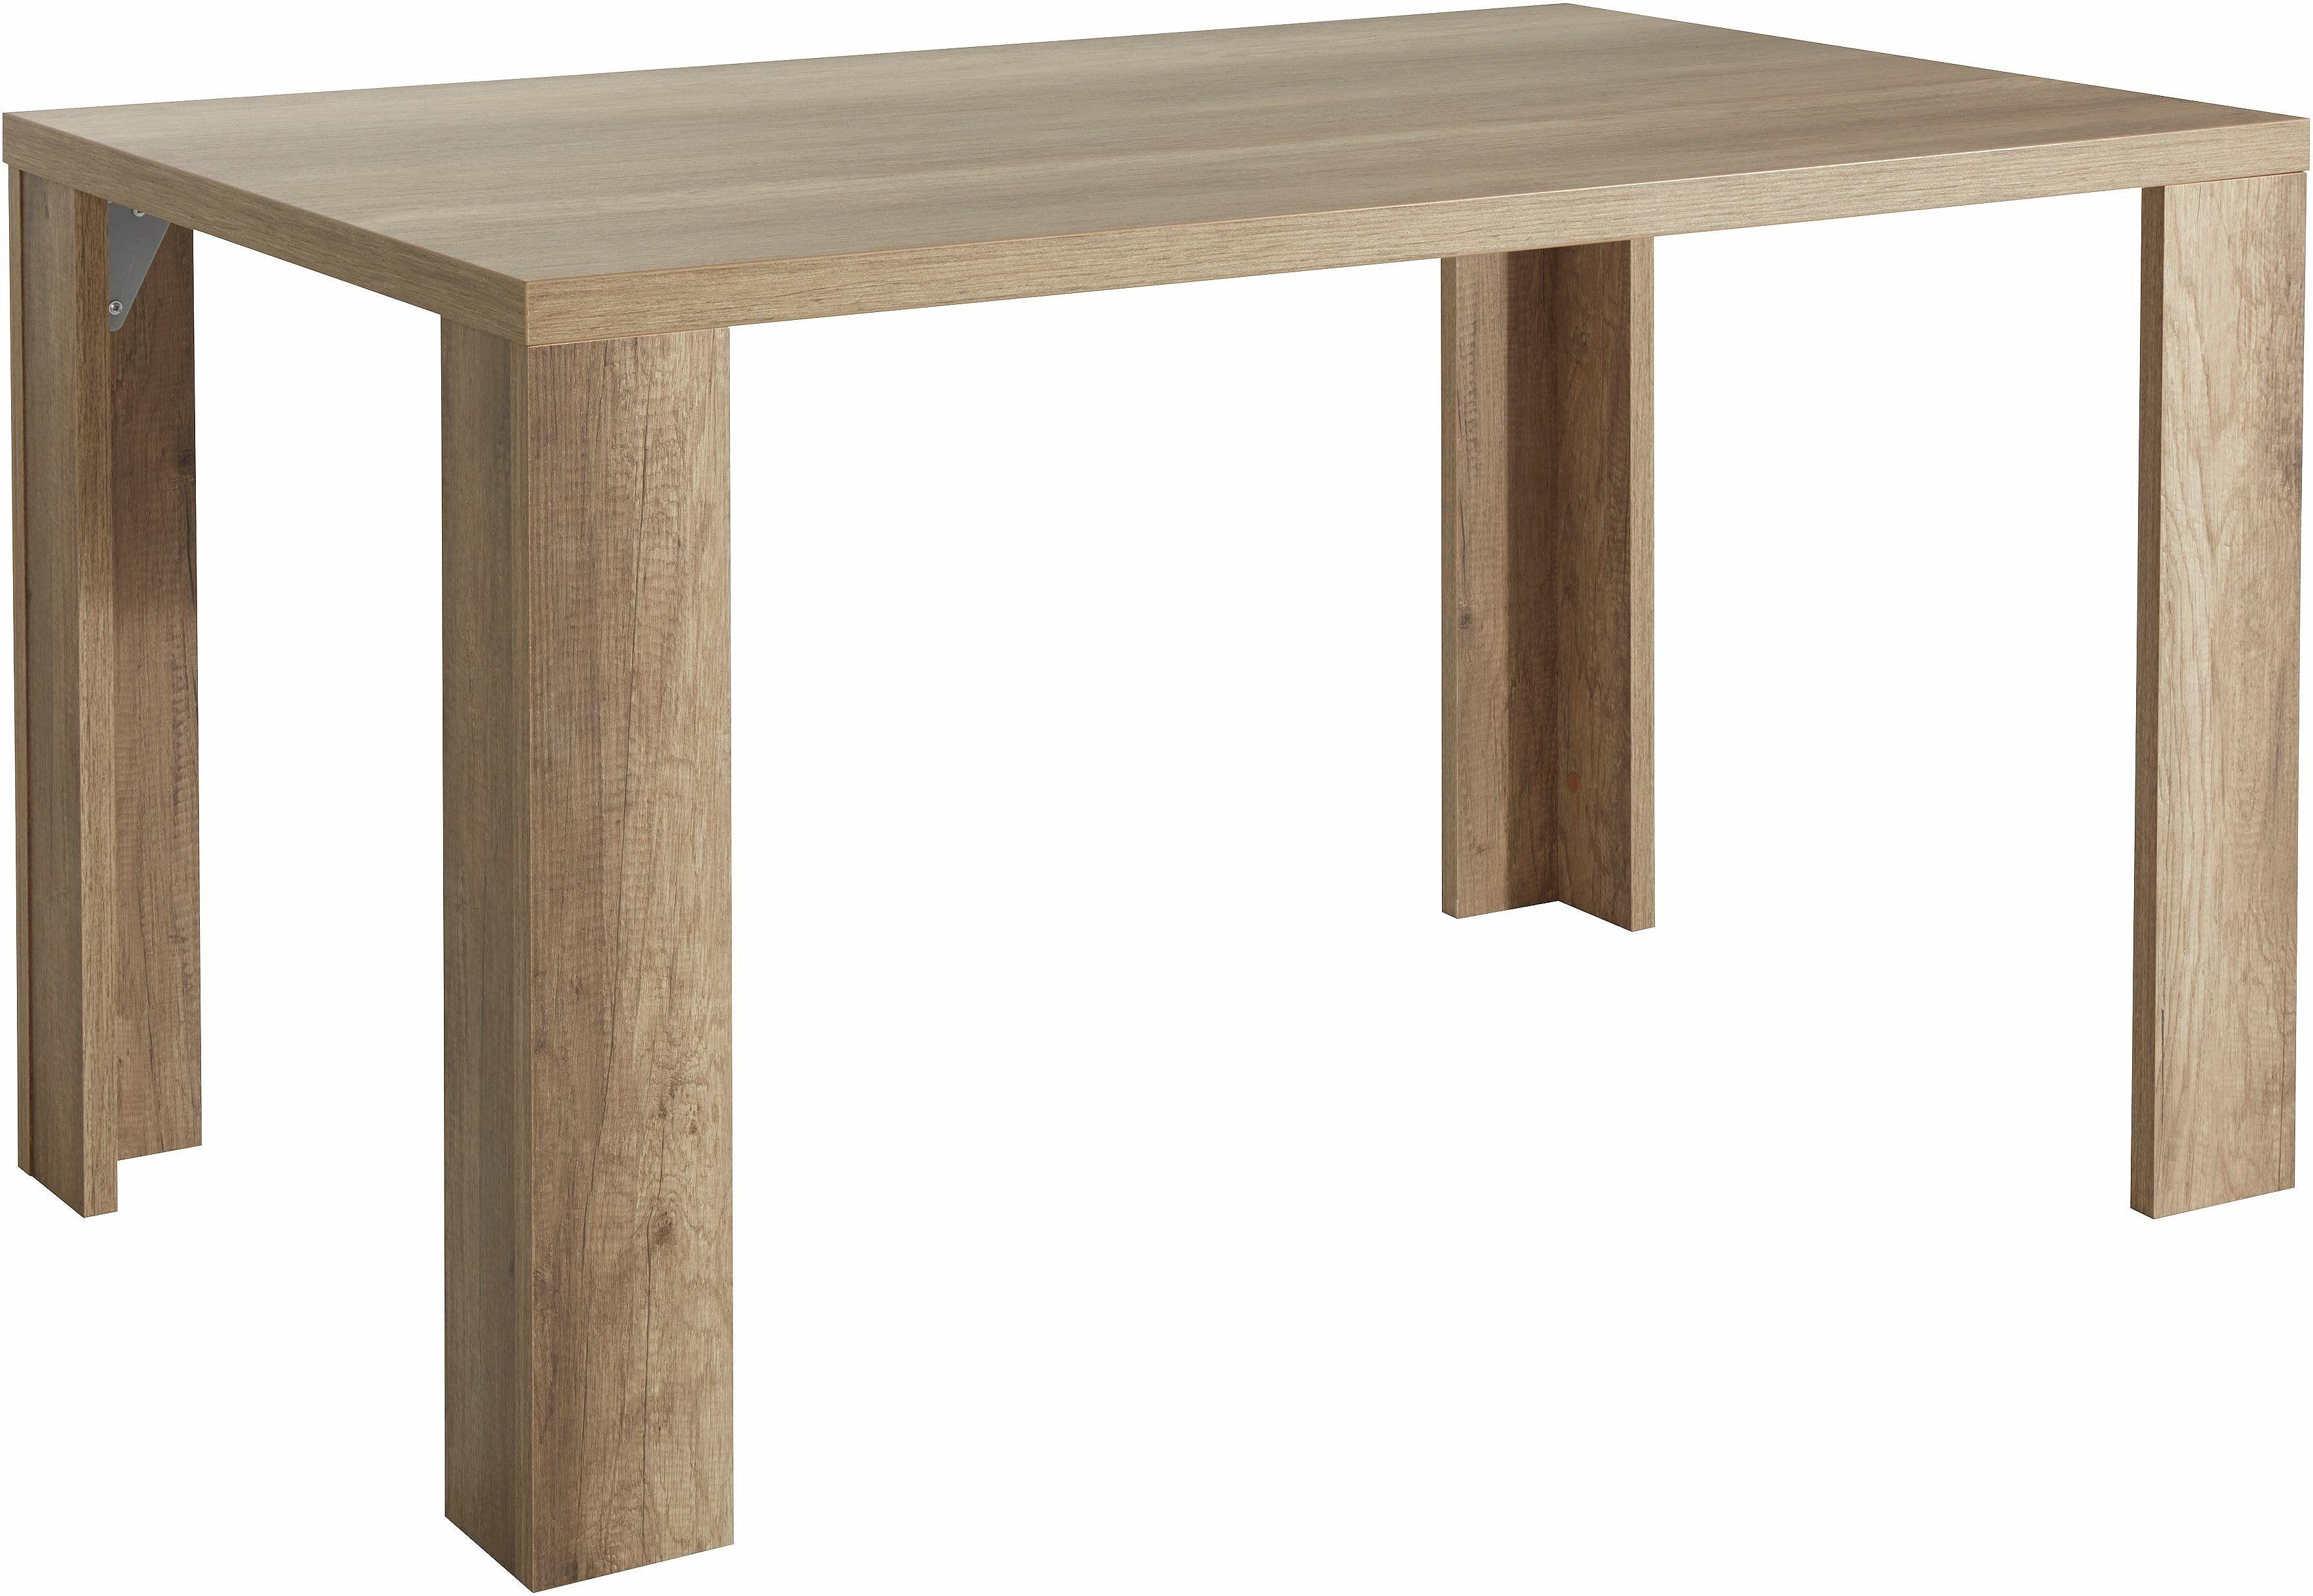 Esstisch In 3 Grossen Jetzt Bestellen Unter Https Moebel Ladendirekt De Kueche Und Esszimmer Tische Esstische Uid 4dc8c7b3 3607 Esstisch Tisch Kuche Tisch